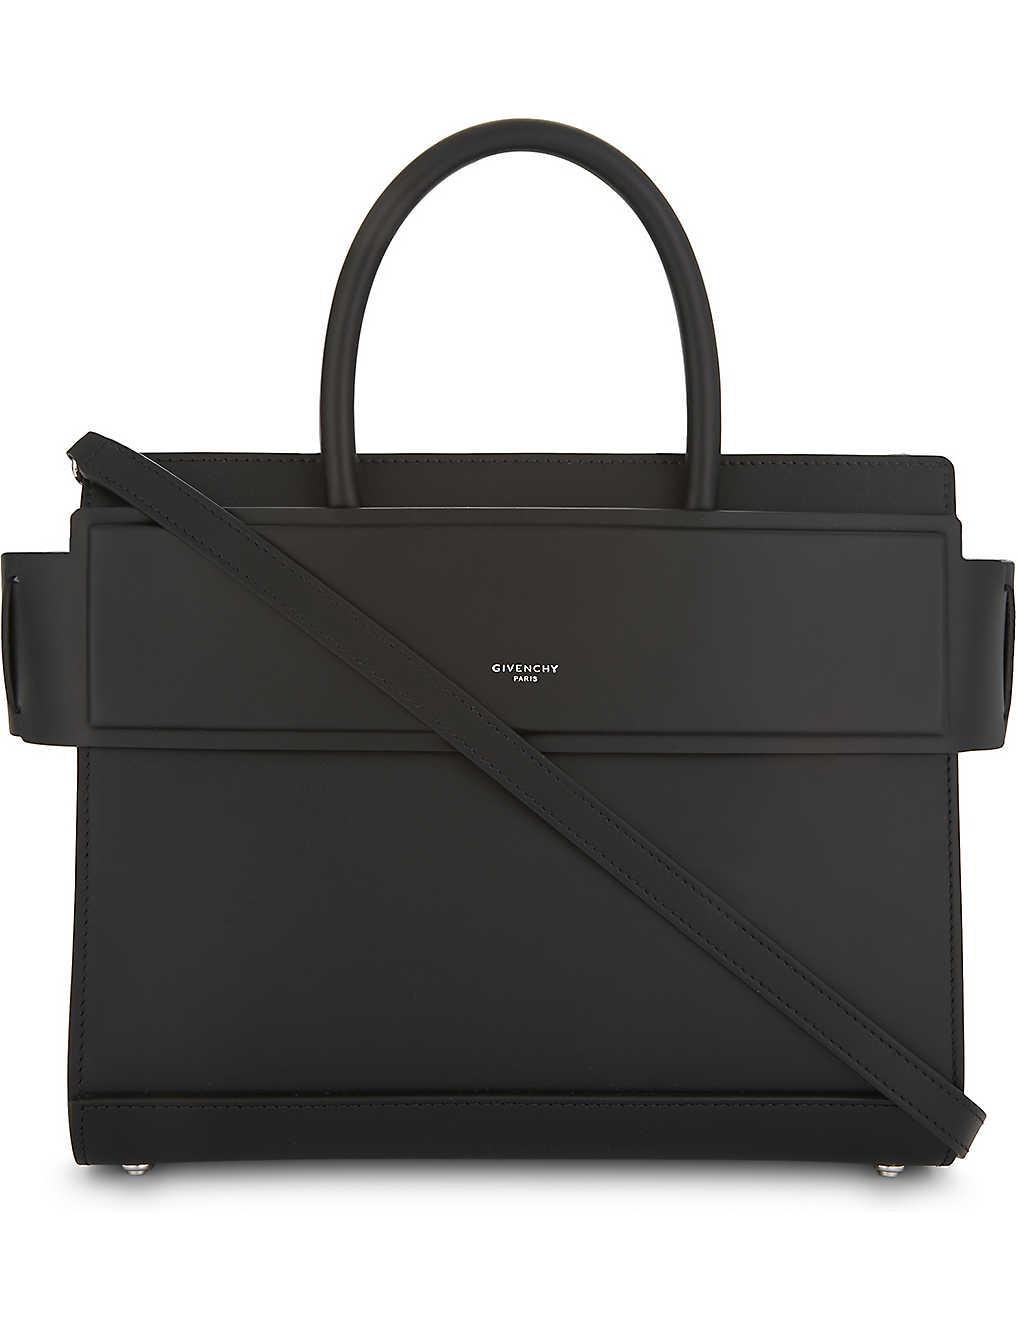 36da7361524be2 GIVENCHY - Horizon small leather shoulder bag